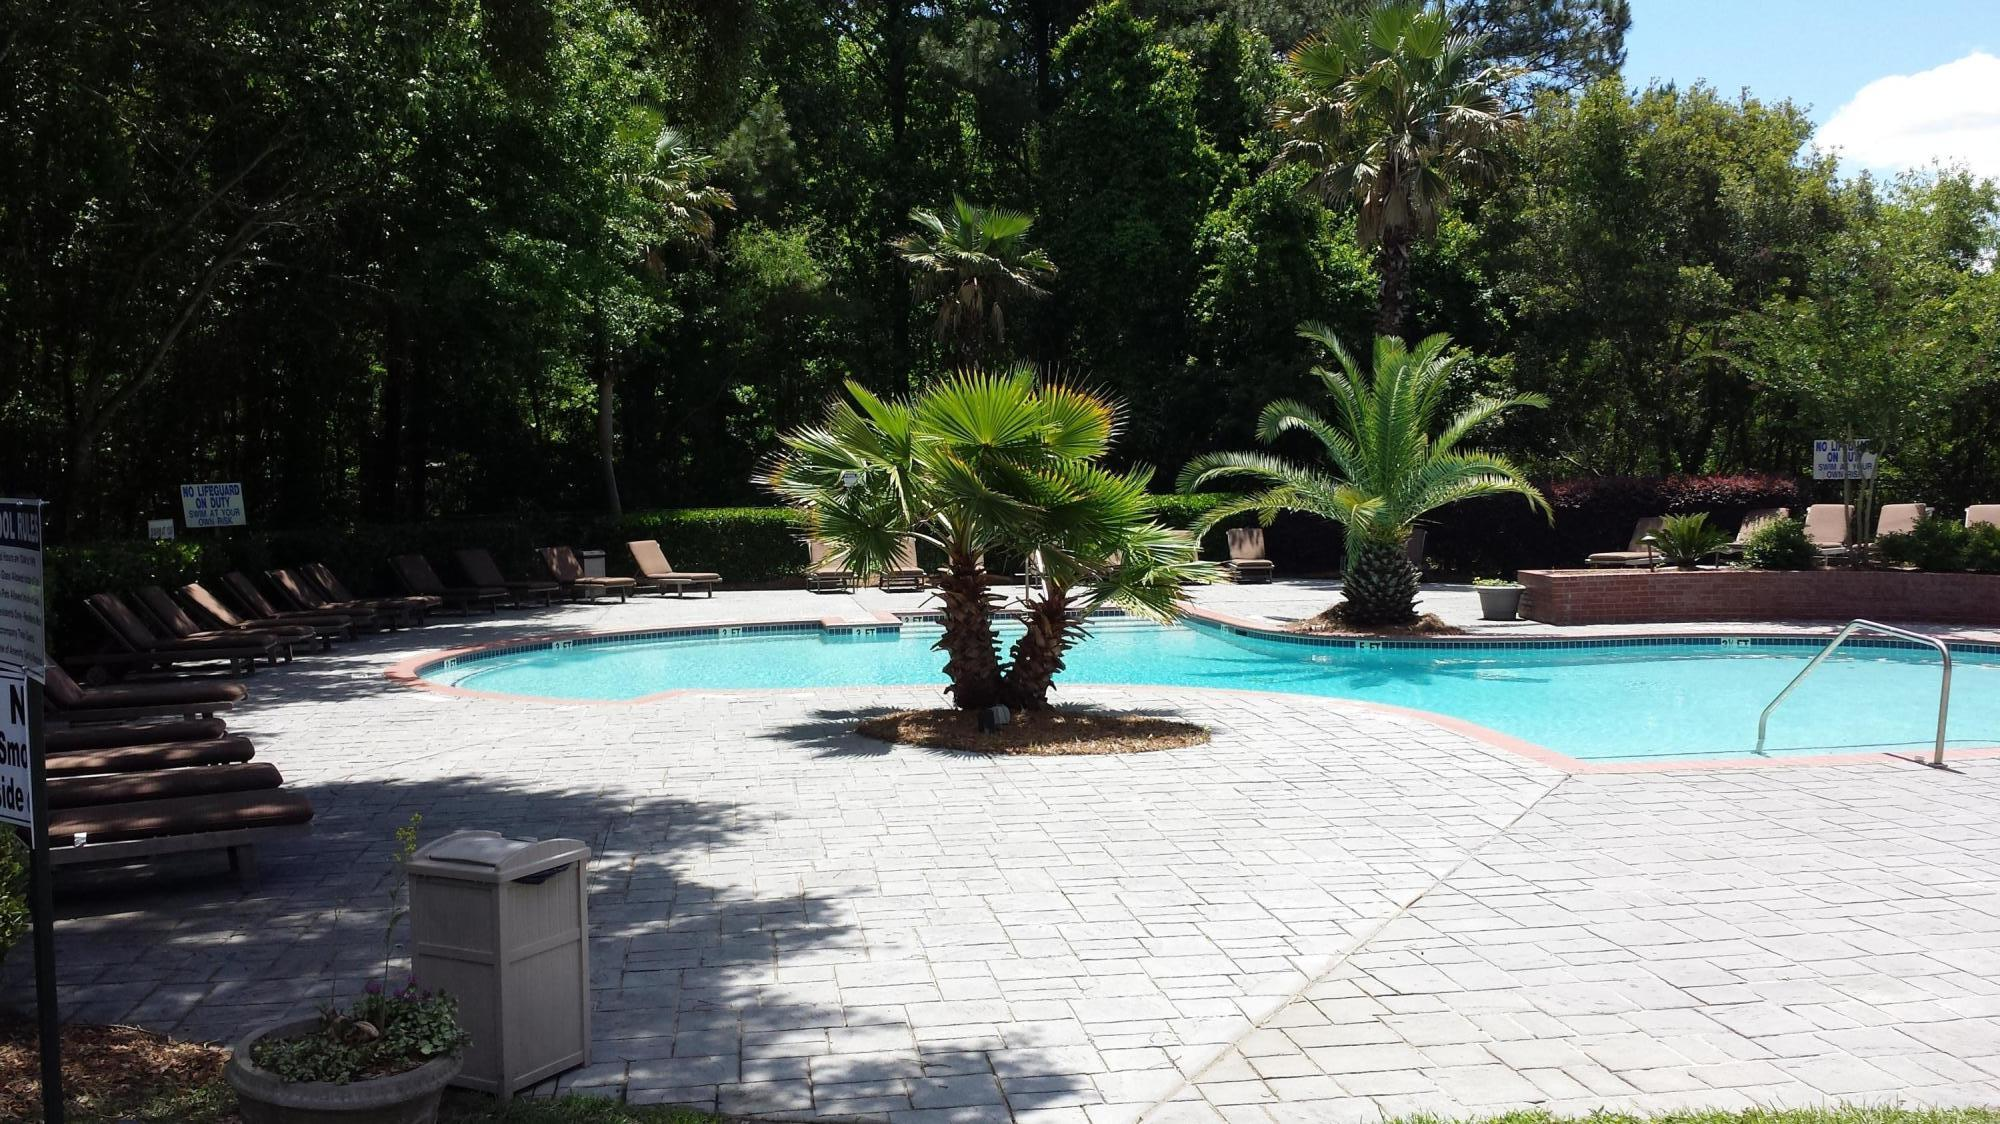 The Peninsula Condominiums Homes For Sale - 700 Daniel Ellis Drive, Charleston, SC - 2